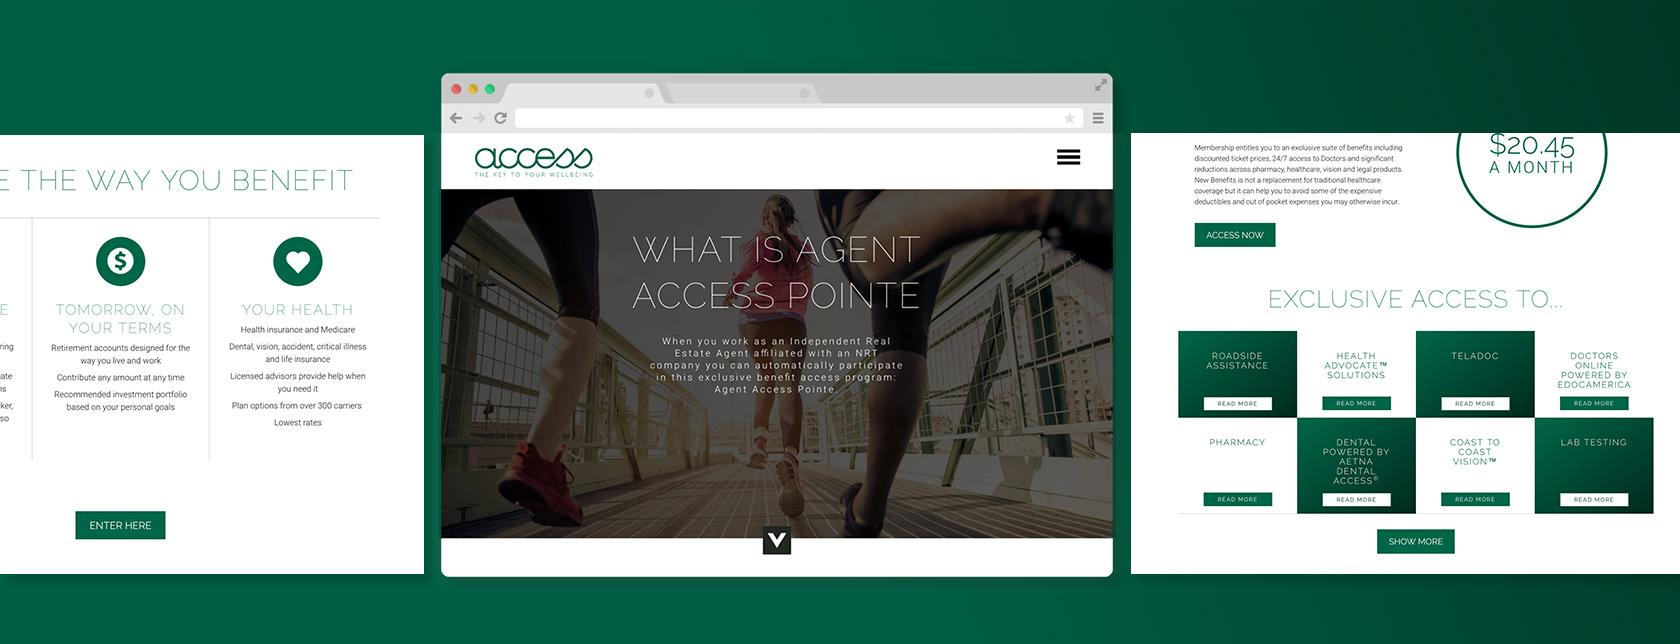 A premium digital benefits portal for independent agents